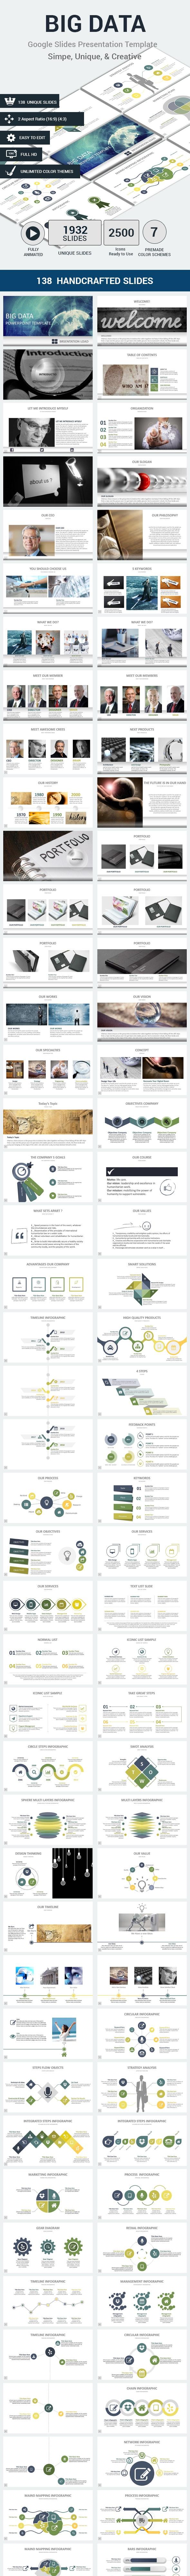 BIG DATAS Google Slides Presentation Template - Google Slides Presentation Templates